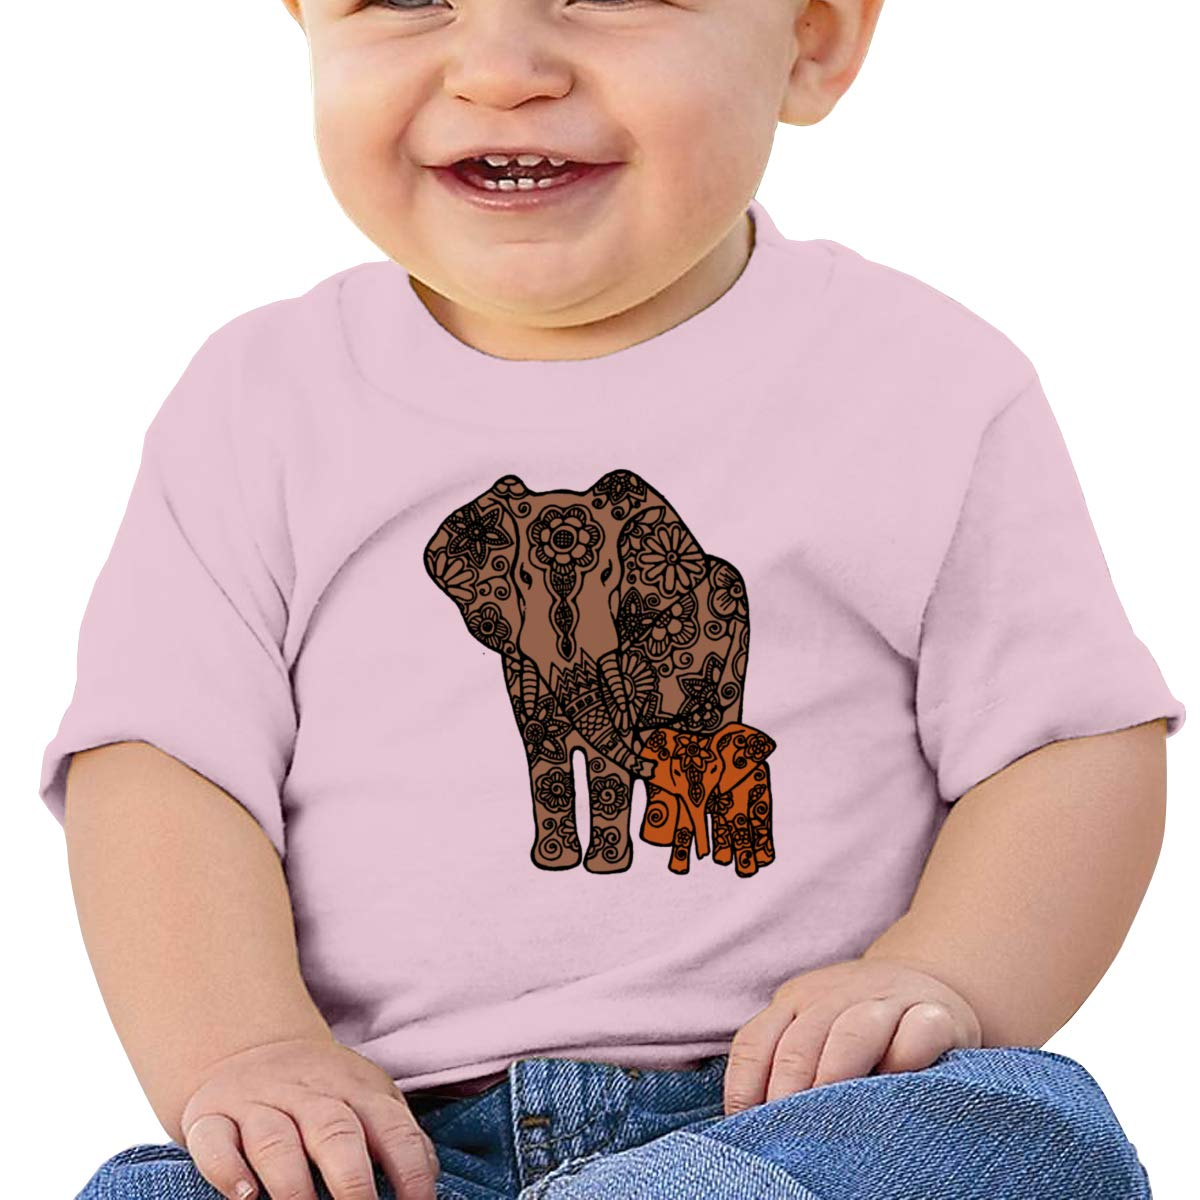 Elephant Family Short-Sleeve Tshirt Baby Boy Kids